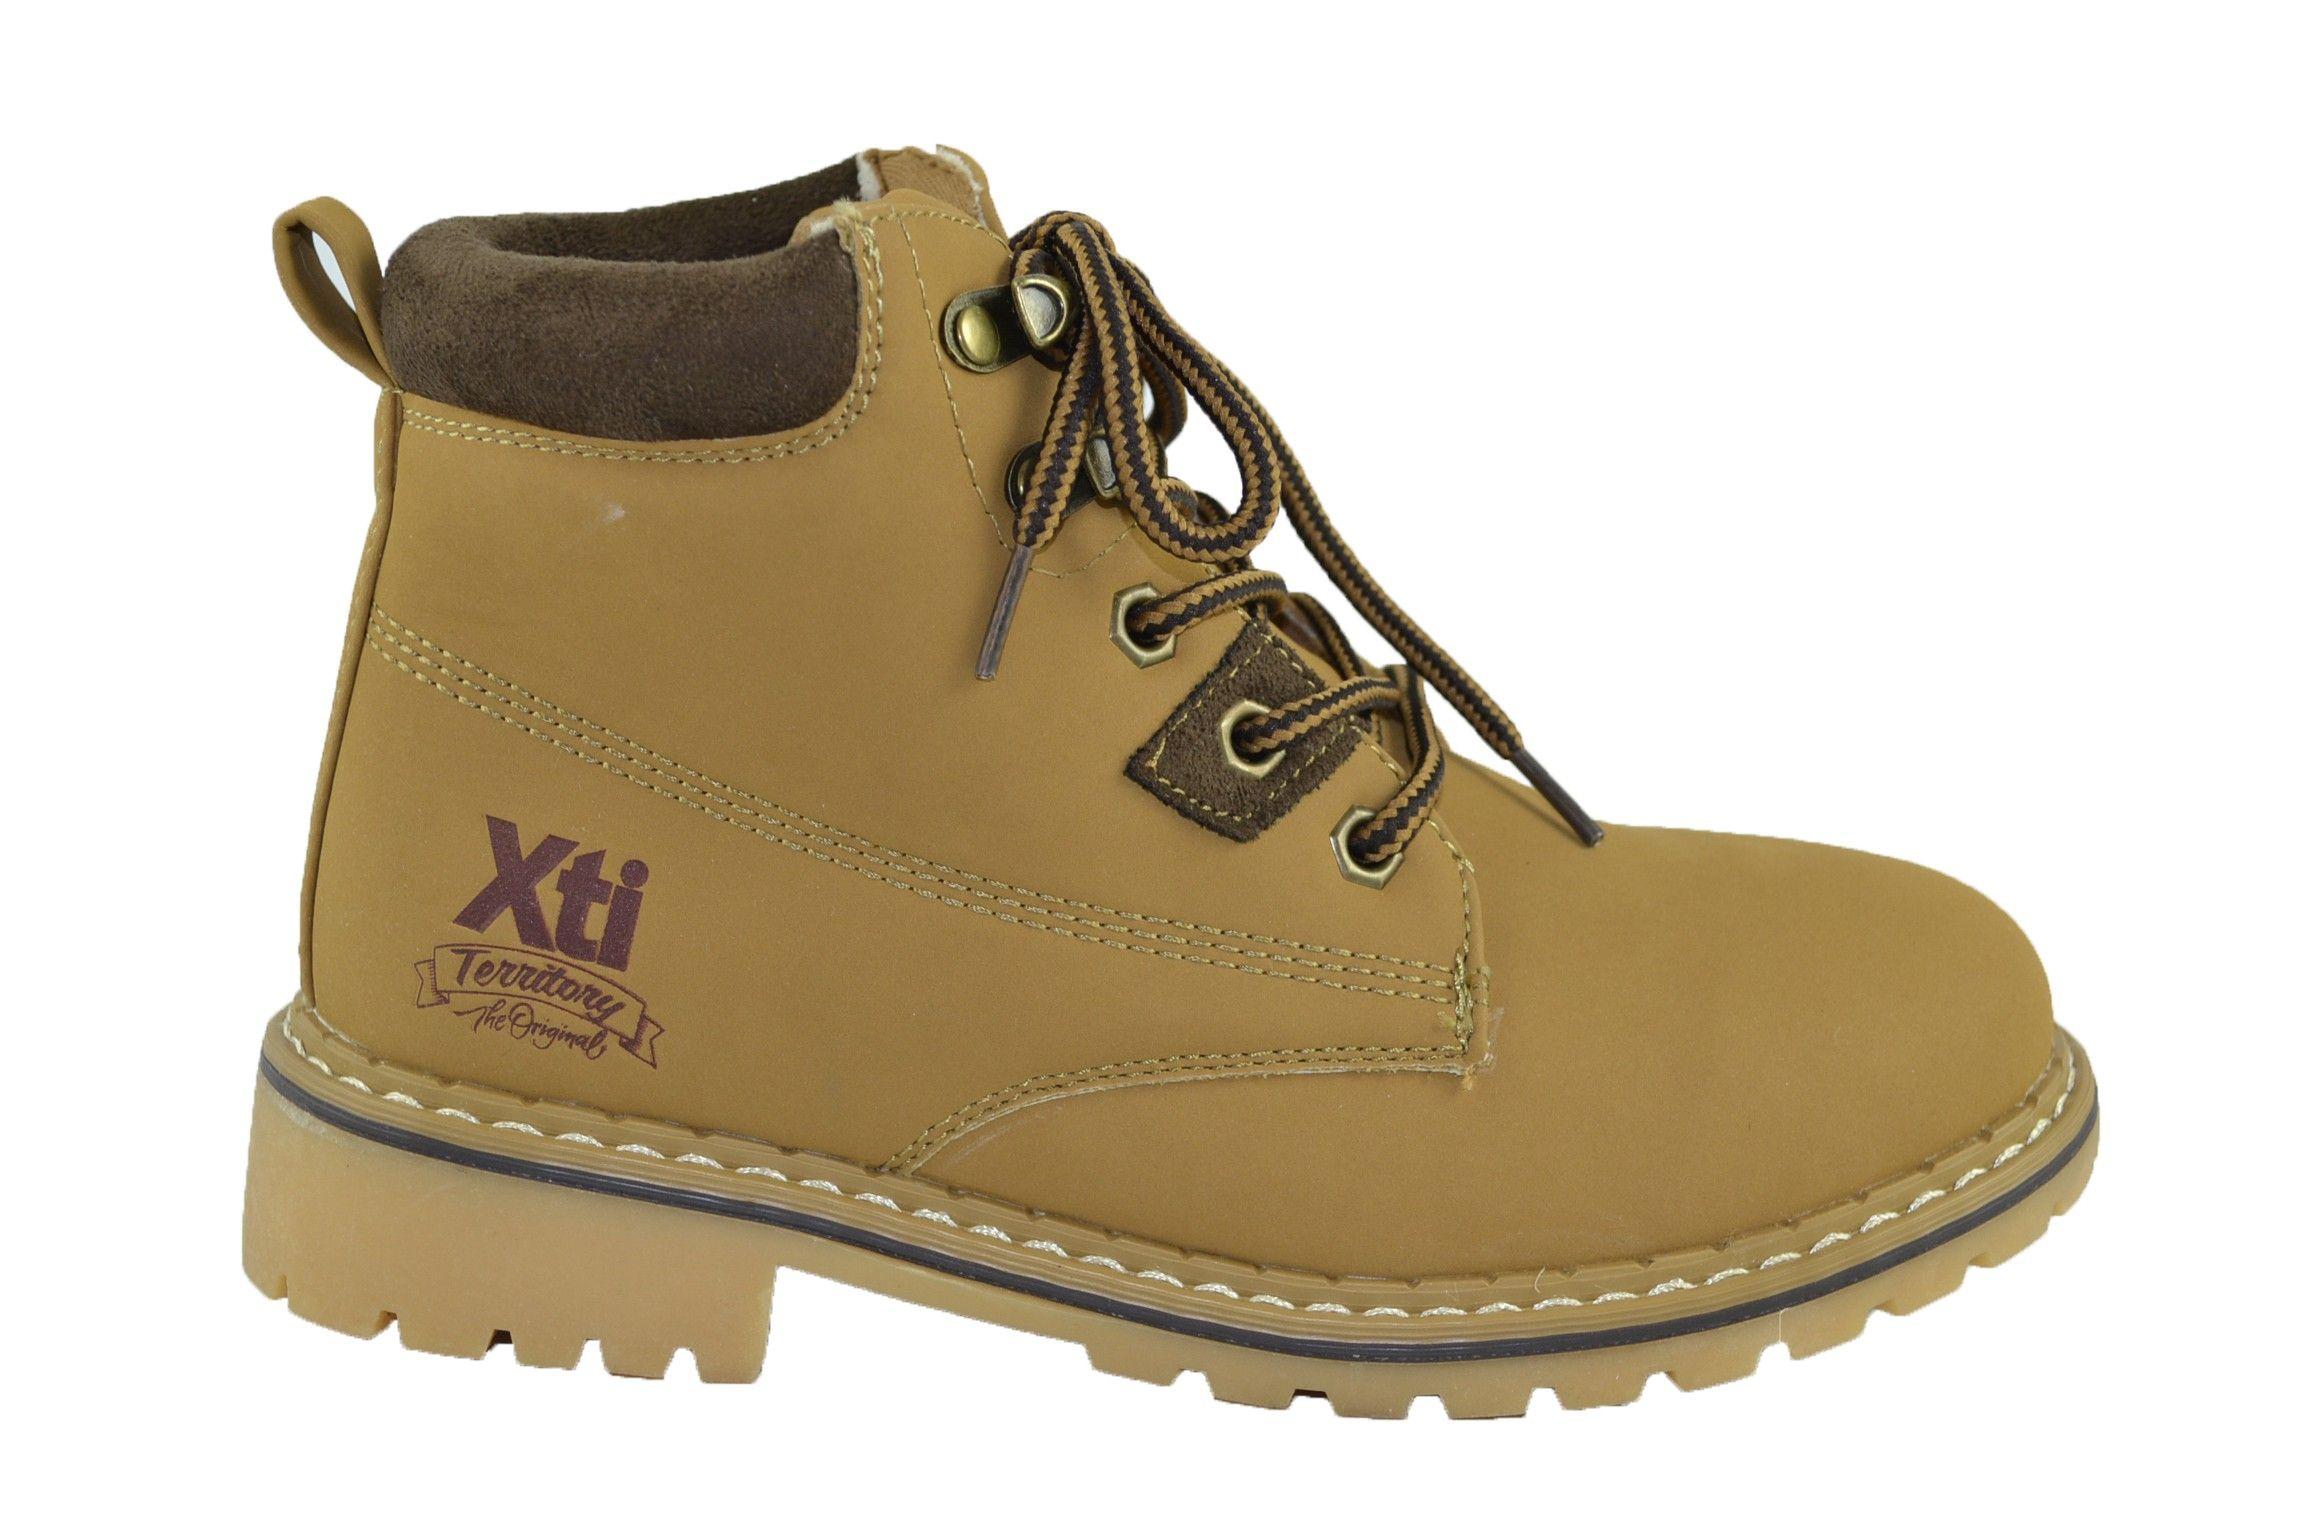 5daac968 Botines panama marron XTI KIDS | Zapatos niñ@s | Zapatos, Calzado ...